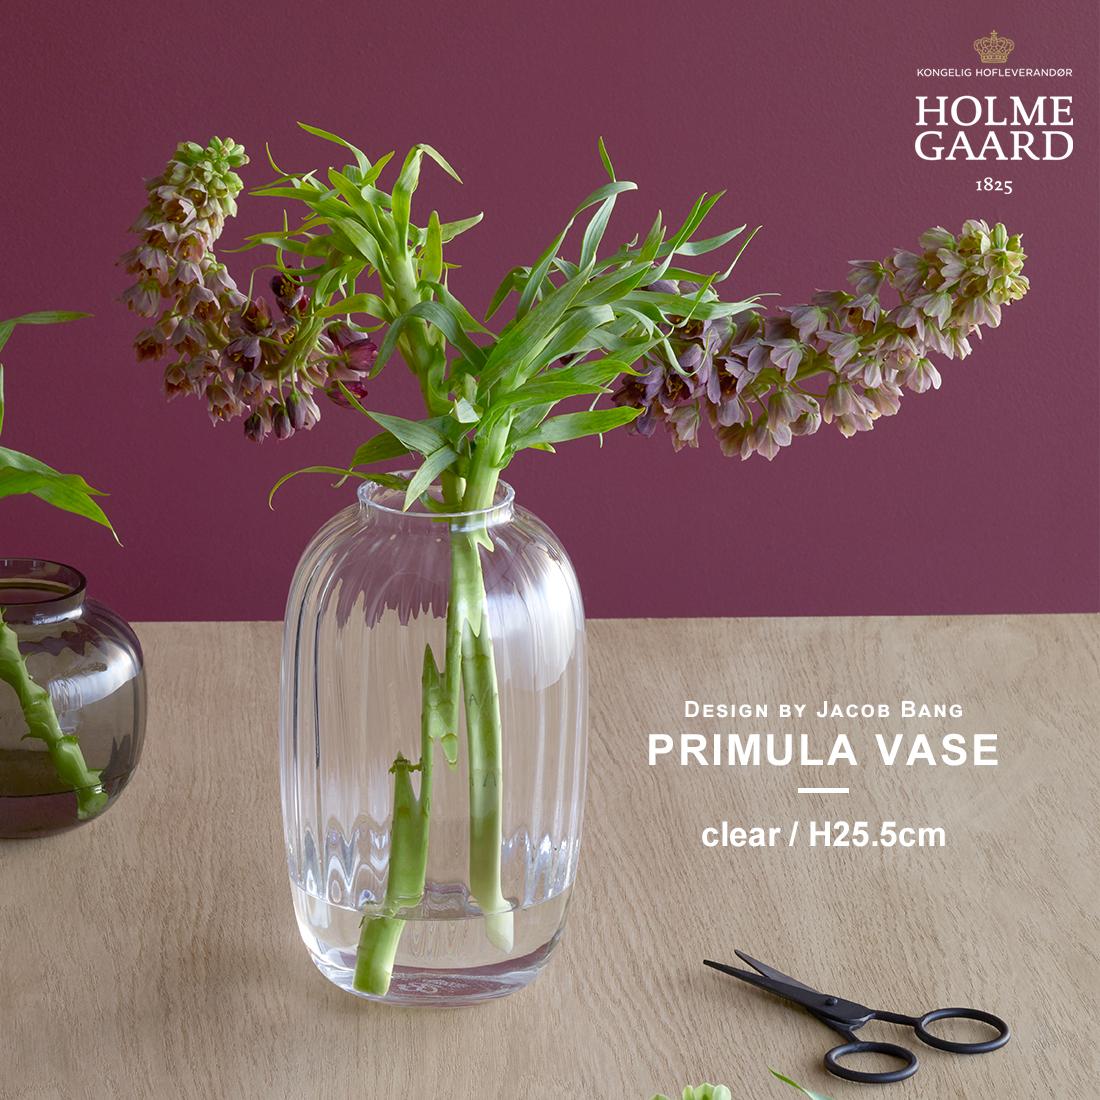 【HOLMEGAARD ホルムガード】Primula Vase clear H25,5 プリムラ フラワーベース花器 ポット ガラス 花瓶 北欧 コンビニ受取対応